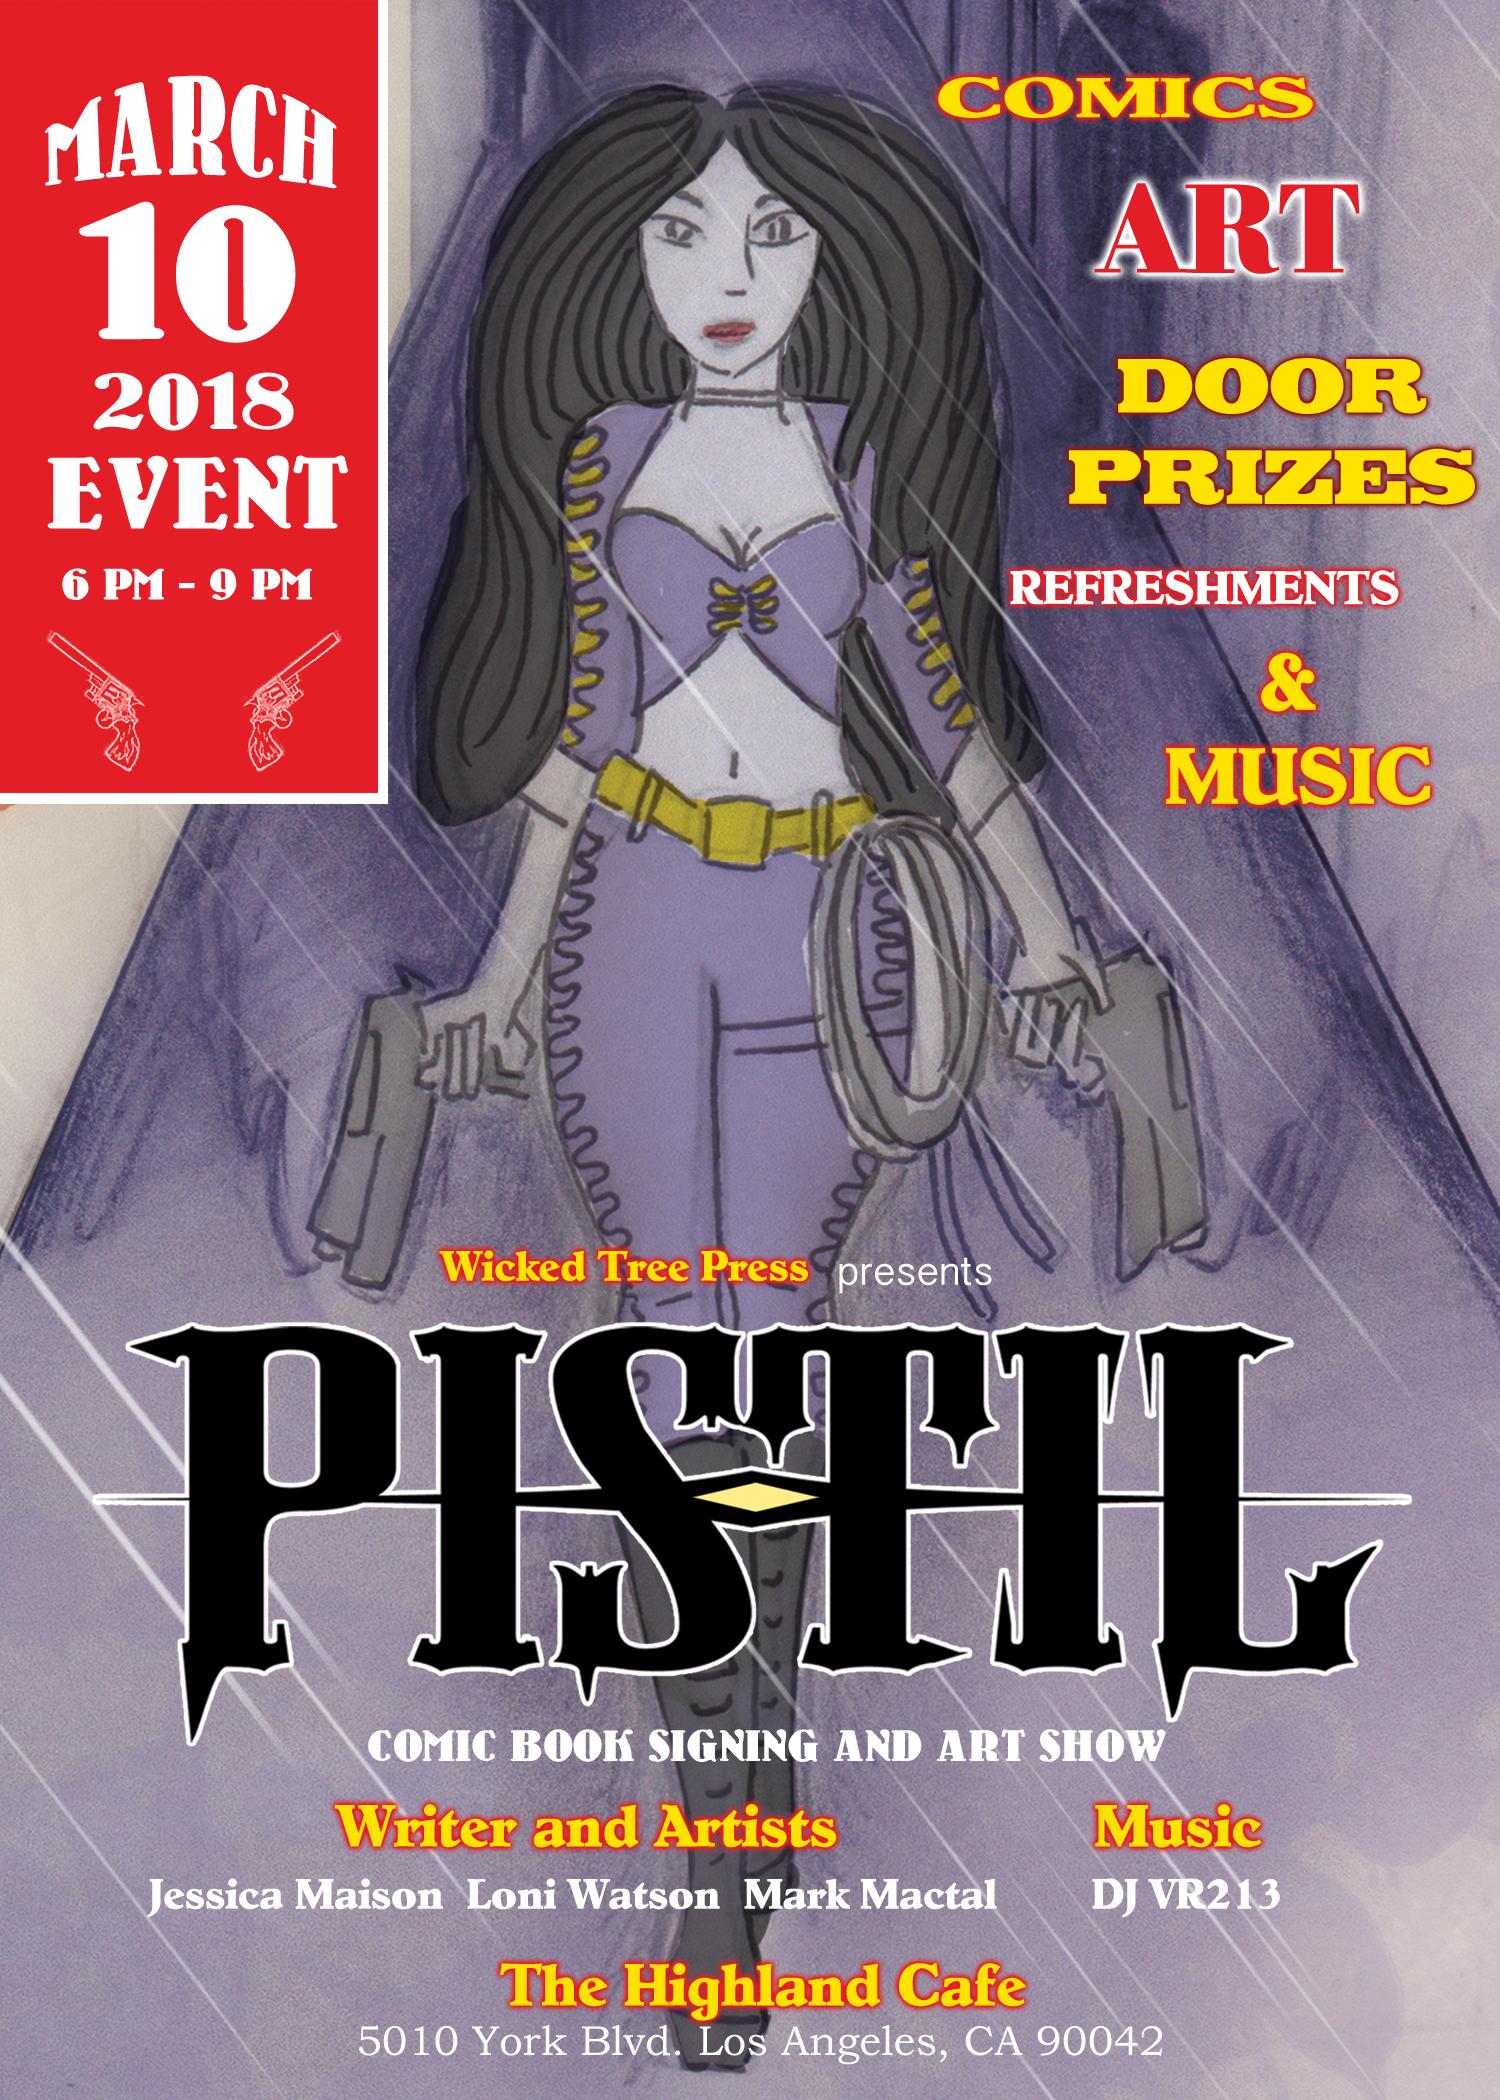 Pistil March 10th event.jpg